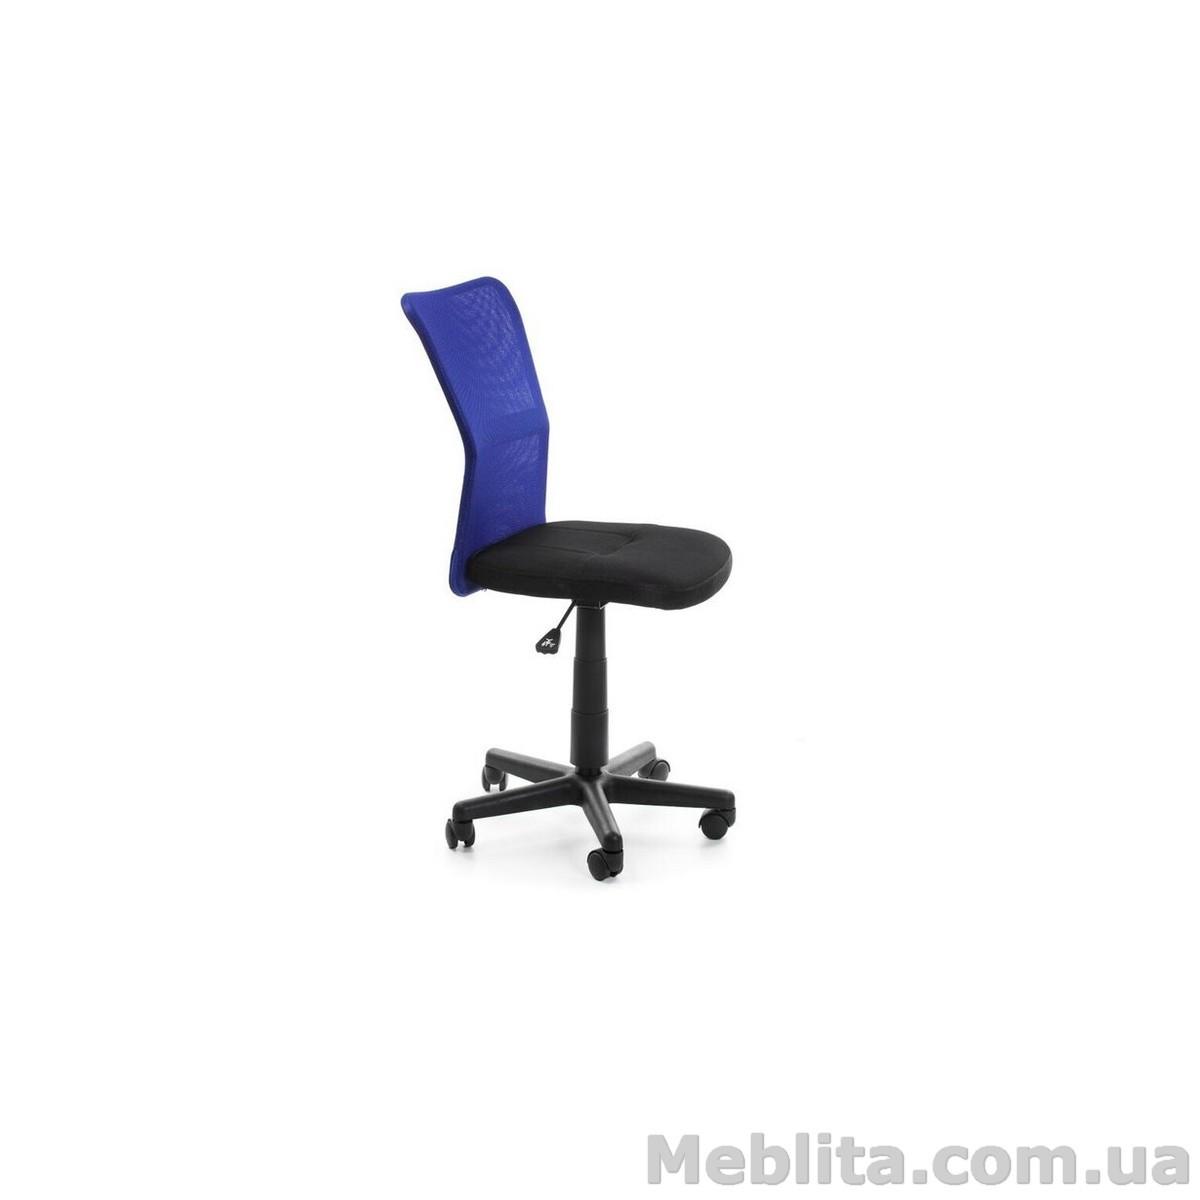 Кресло офисное BELICE, Black/Blue Office4You